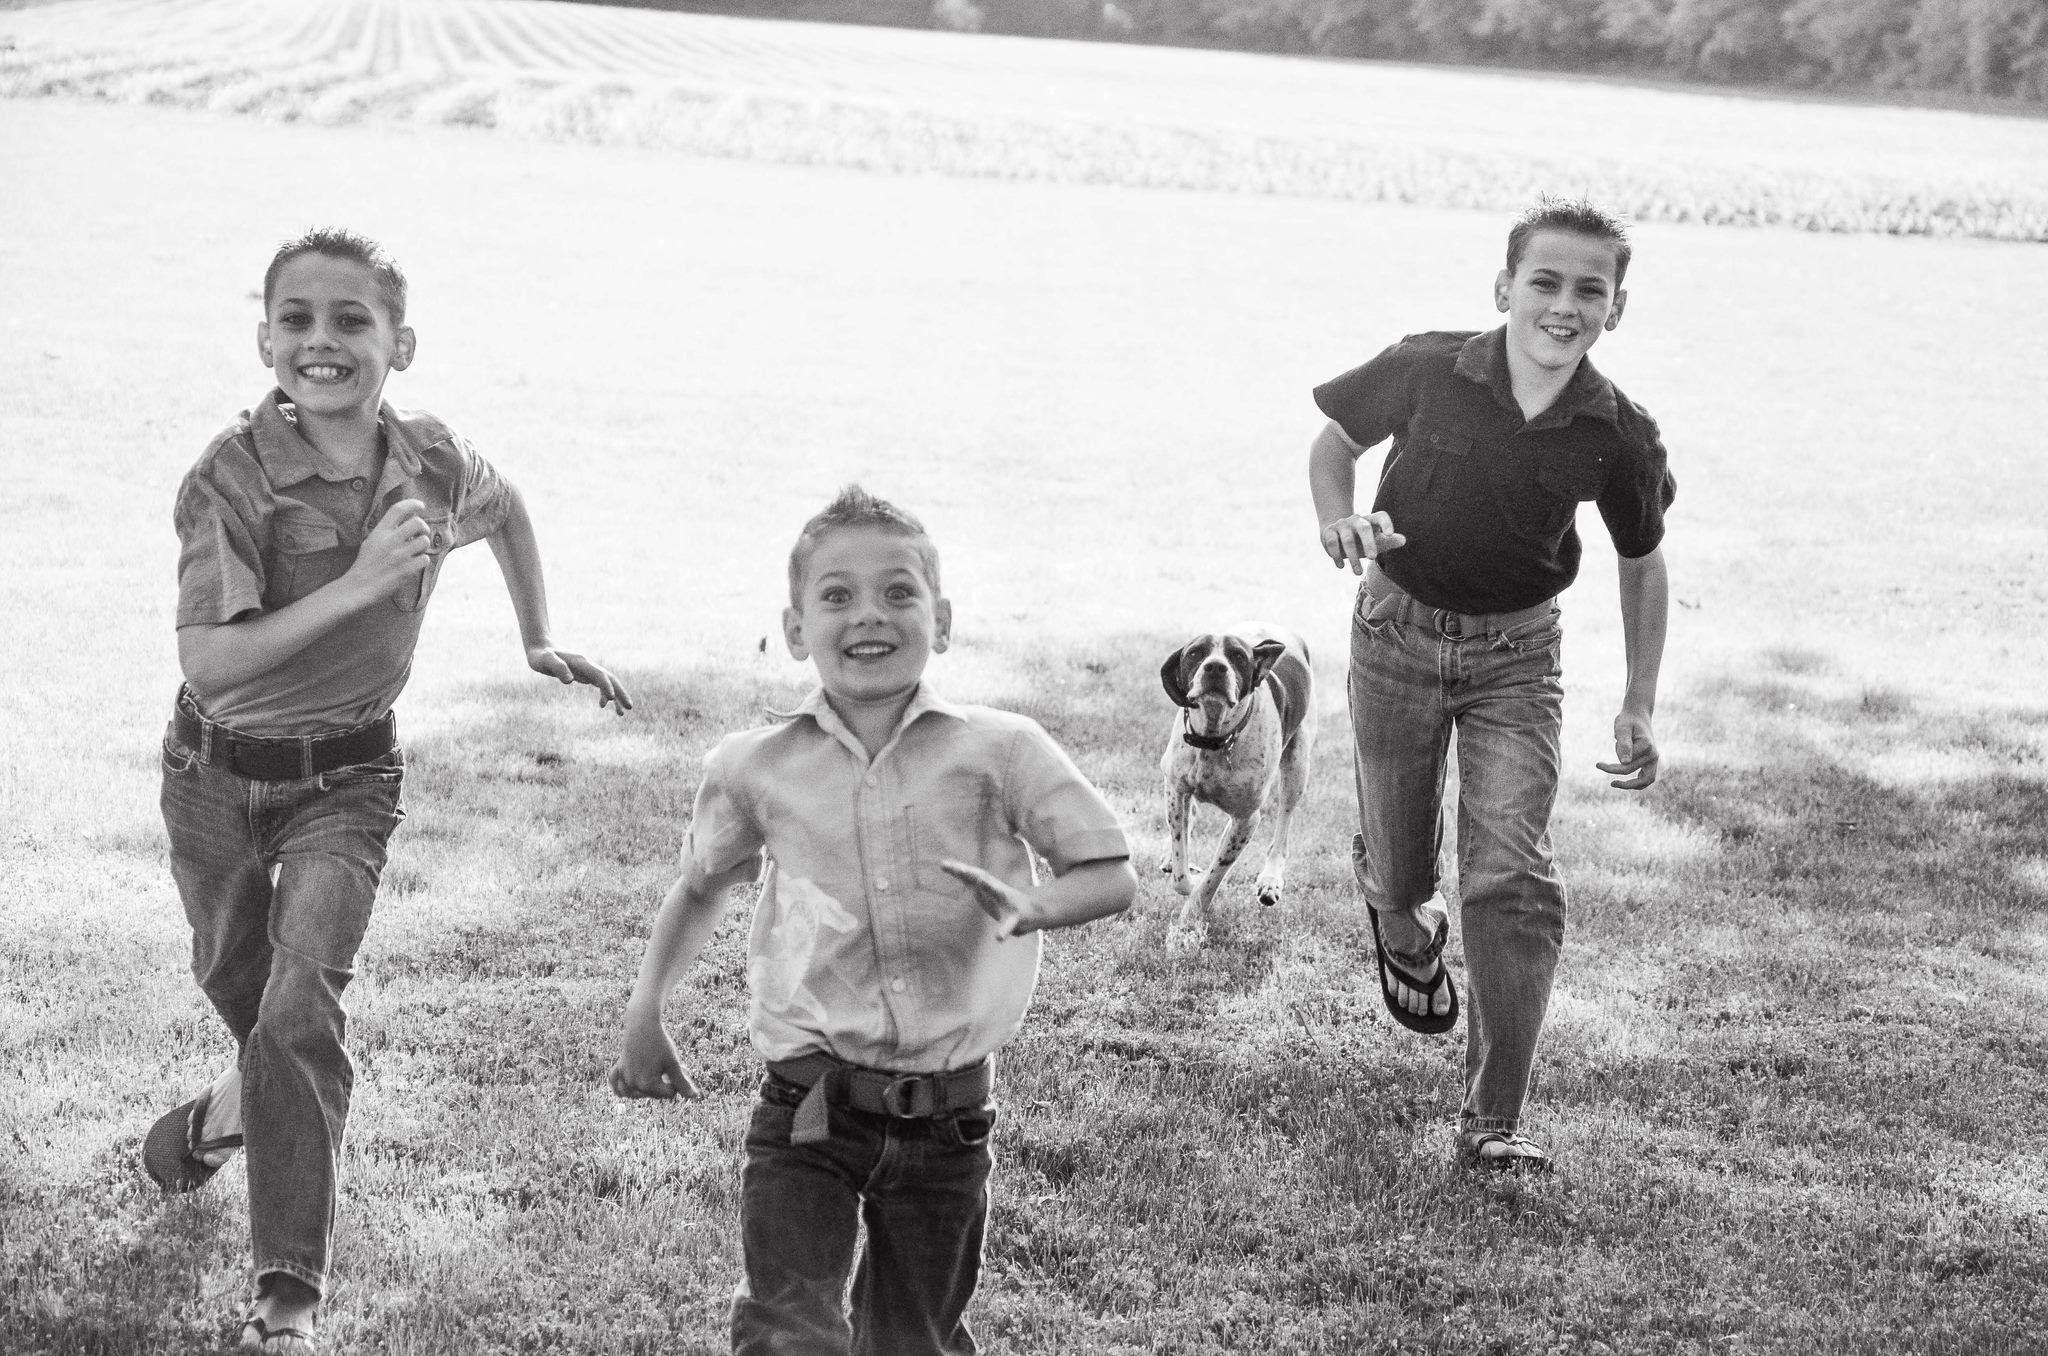 Backyard Family Portrait Ideas : Outdoor family portrait ideas  Inspiration for pictures  Pinterest